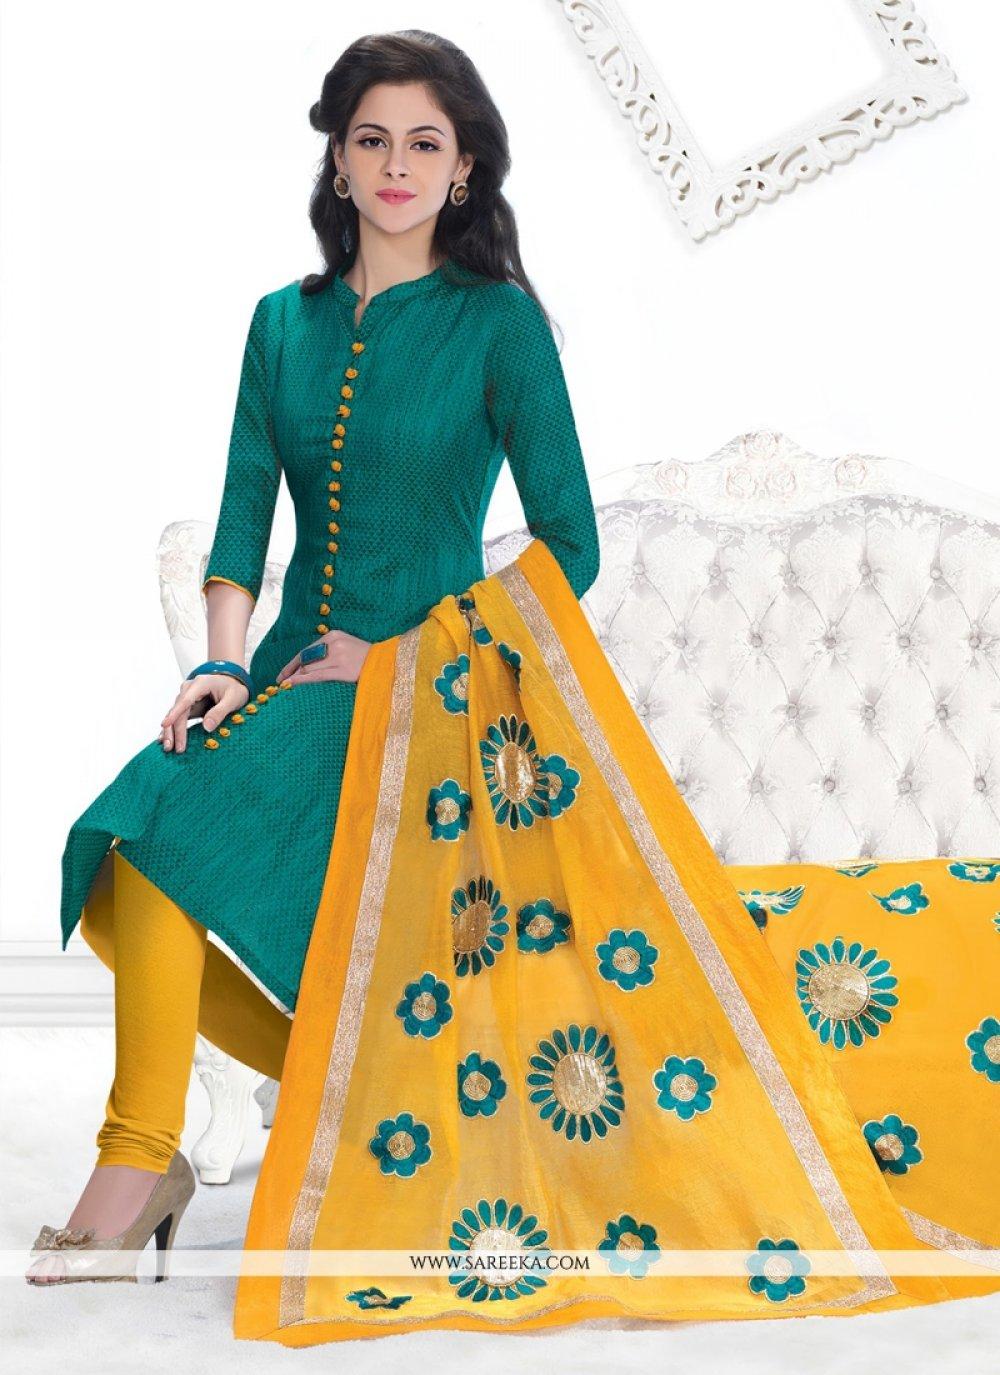 Green Lace Work Jacquard Churidar Designer Suit